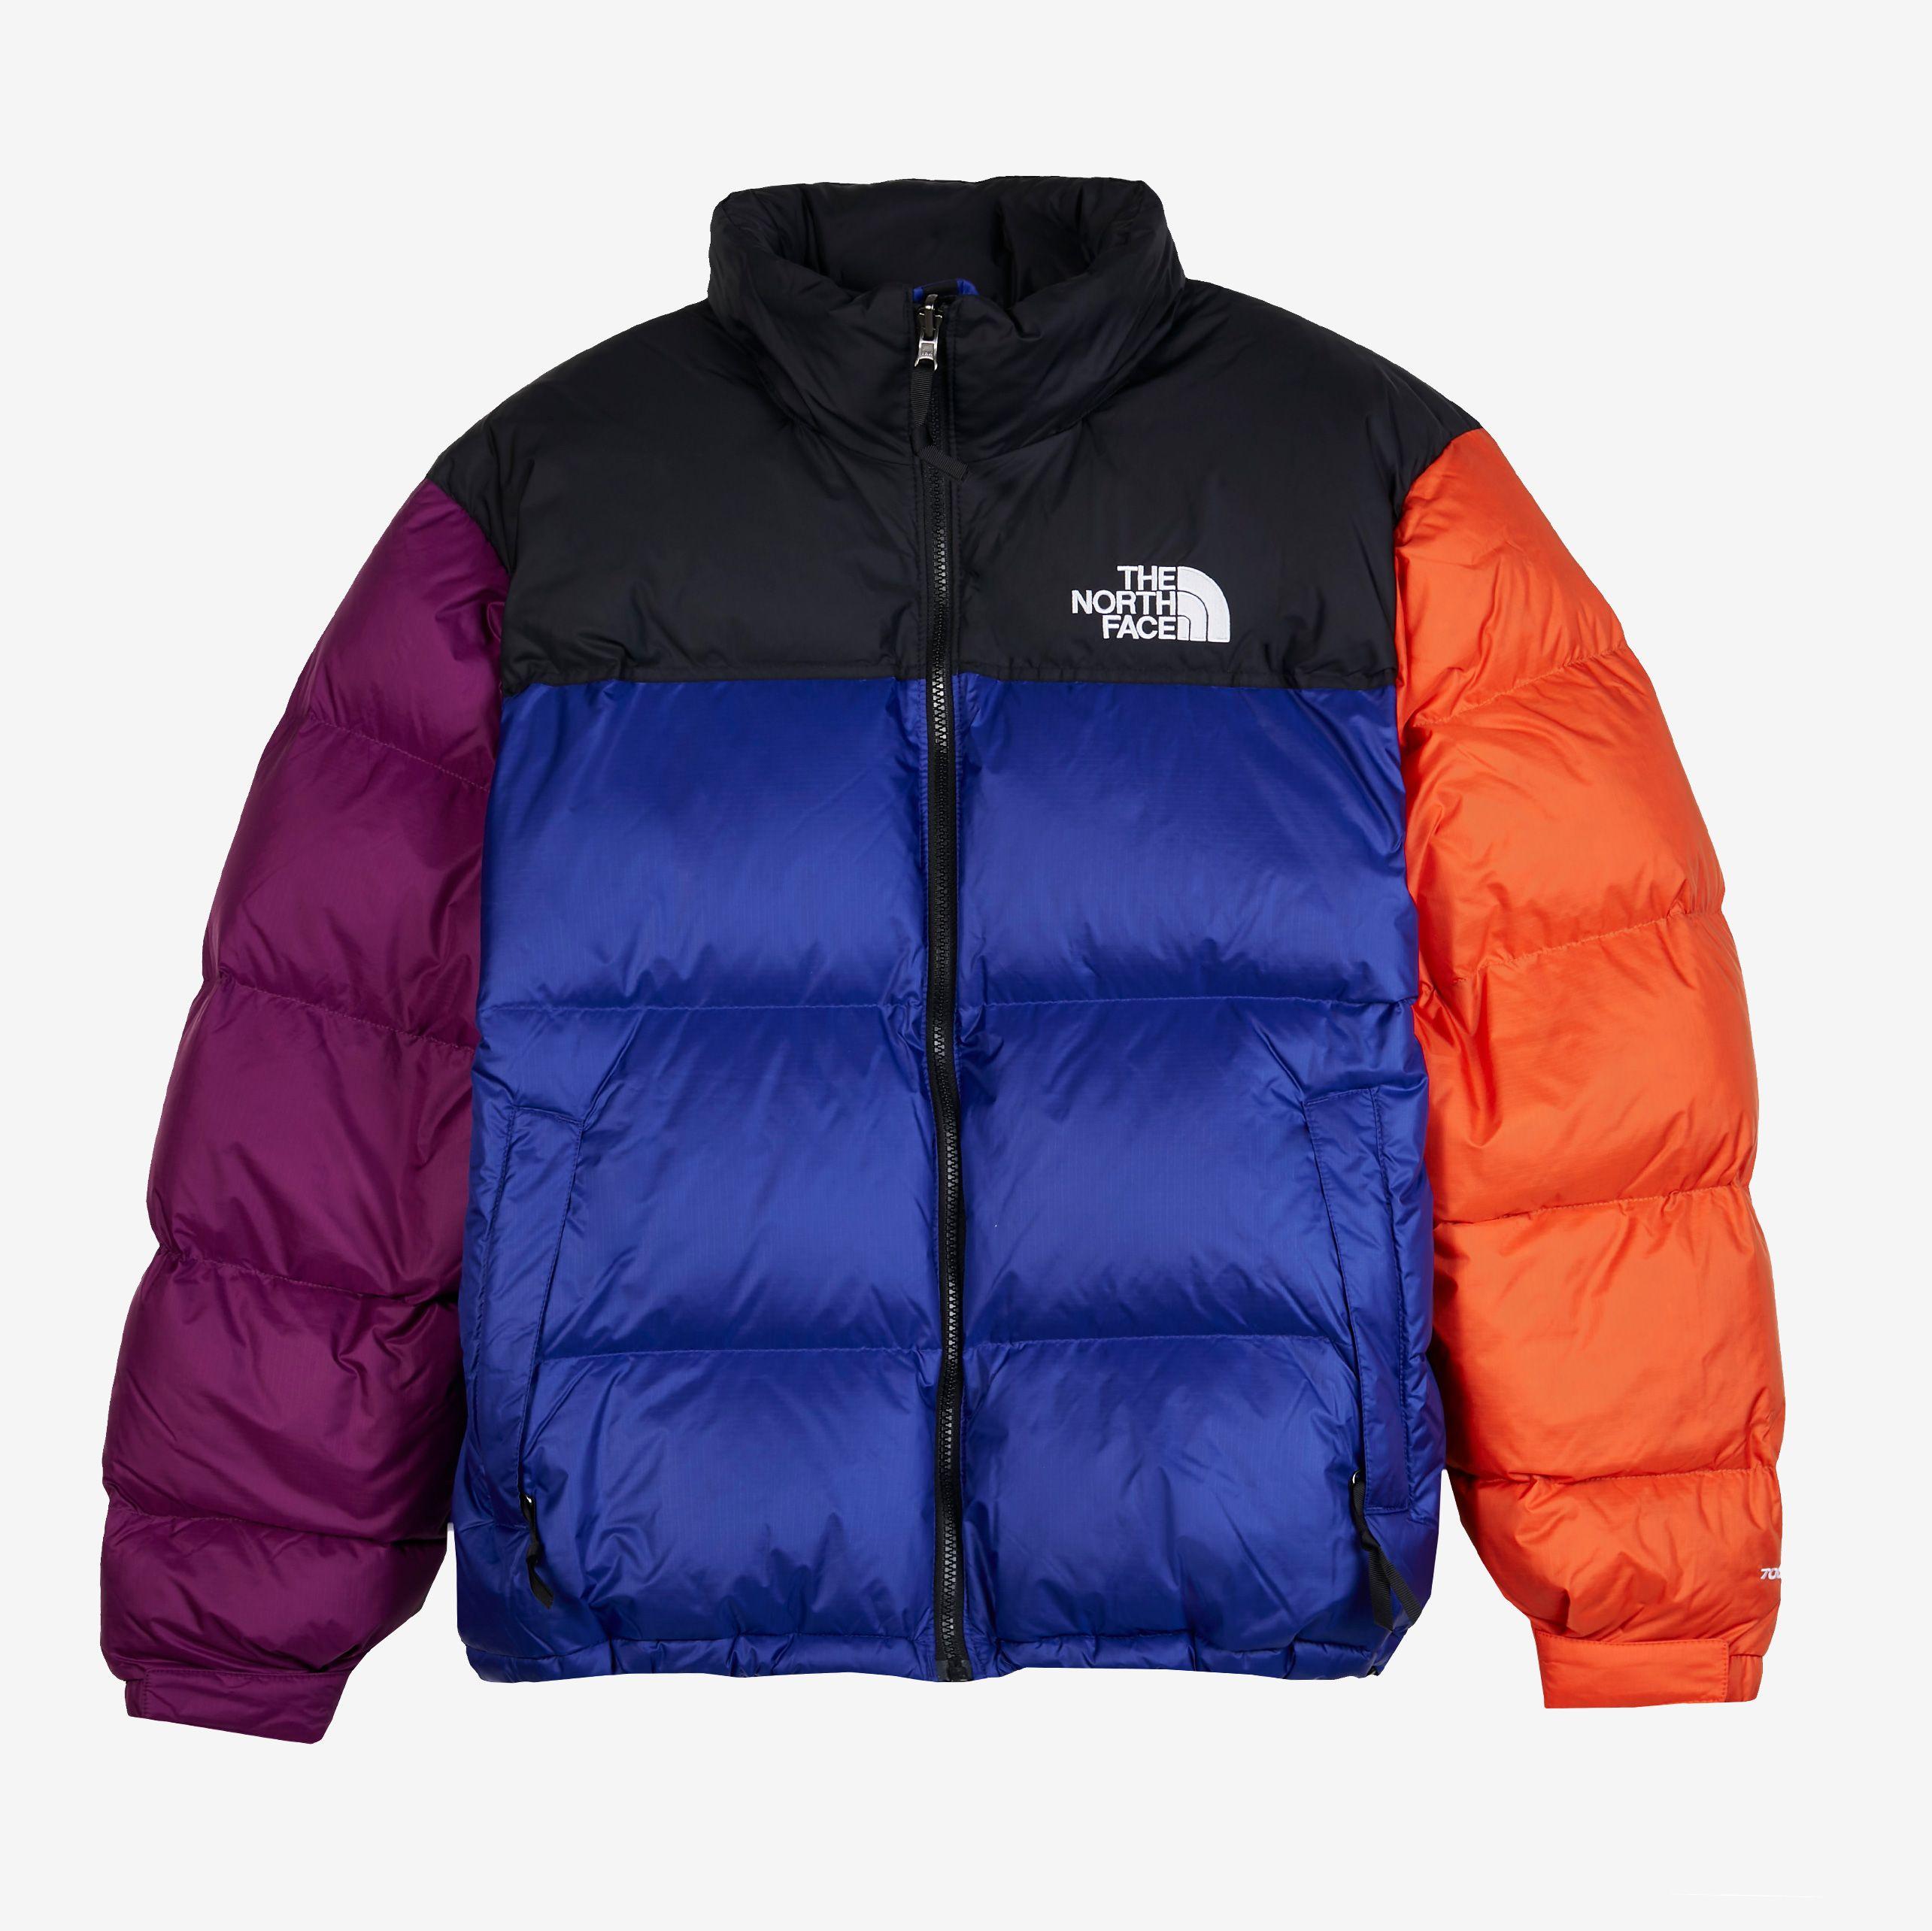 The North Face 1996 Retro Nuptse Jacket T93c8d9qx Sneakersnstuff Sneakers Streetwear Onl Streetwear Online Retro Nuptse Jacket 1996 Retro Nuptse Jacket [ 2568 x 2569 Pixel ]